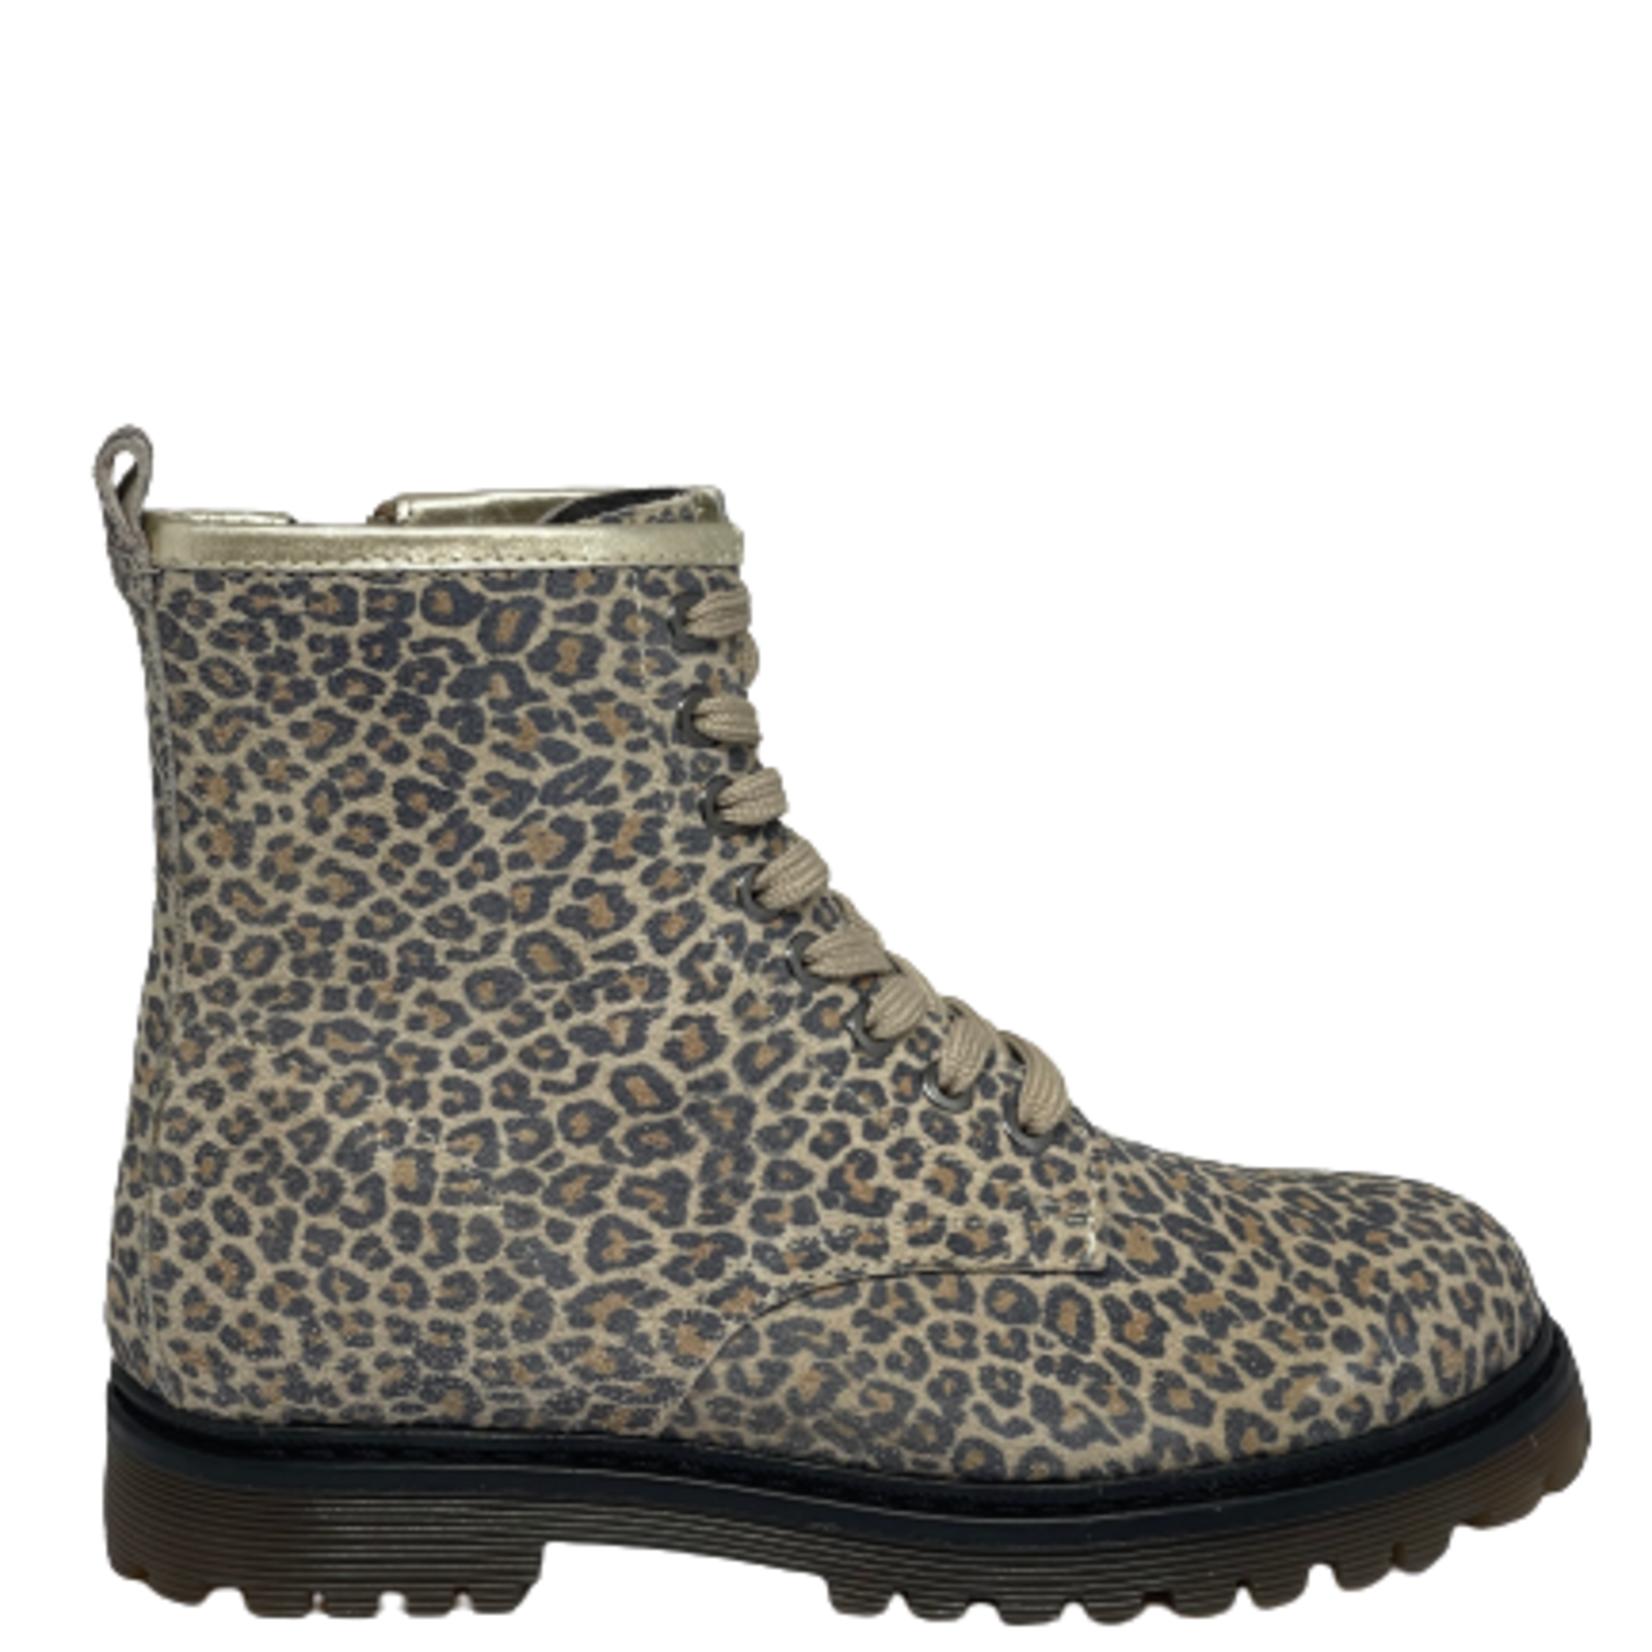 Hoge schoen Leopard